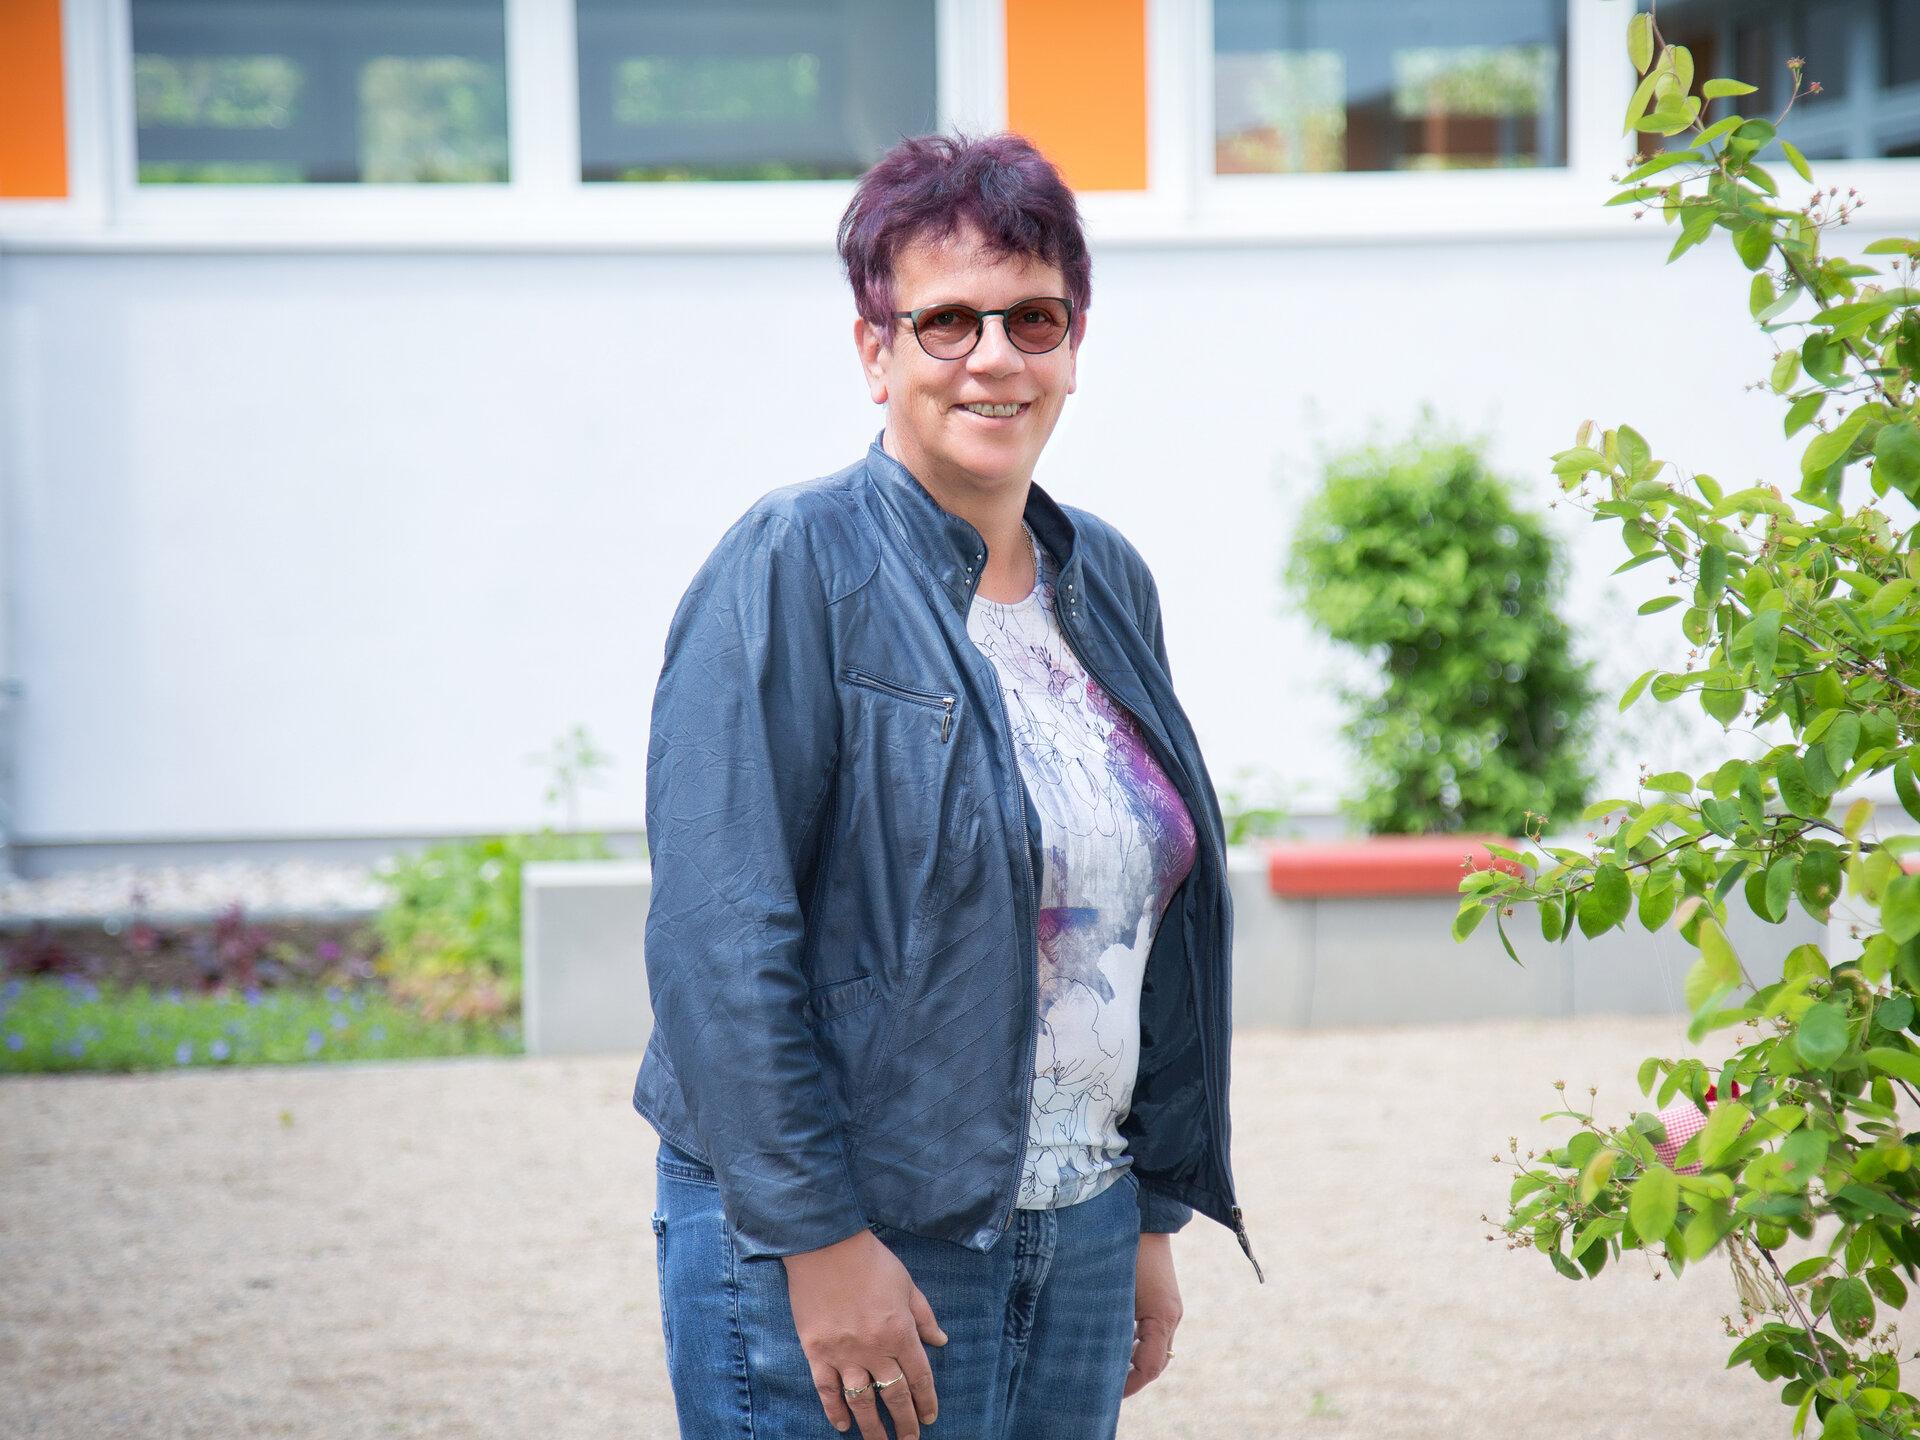 Frau Markowski